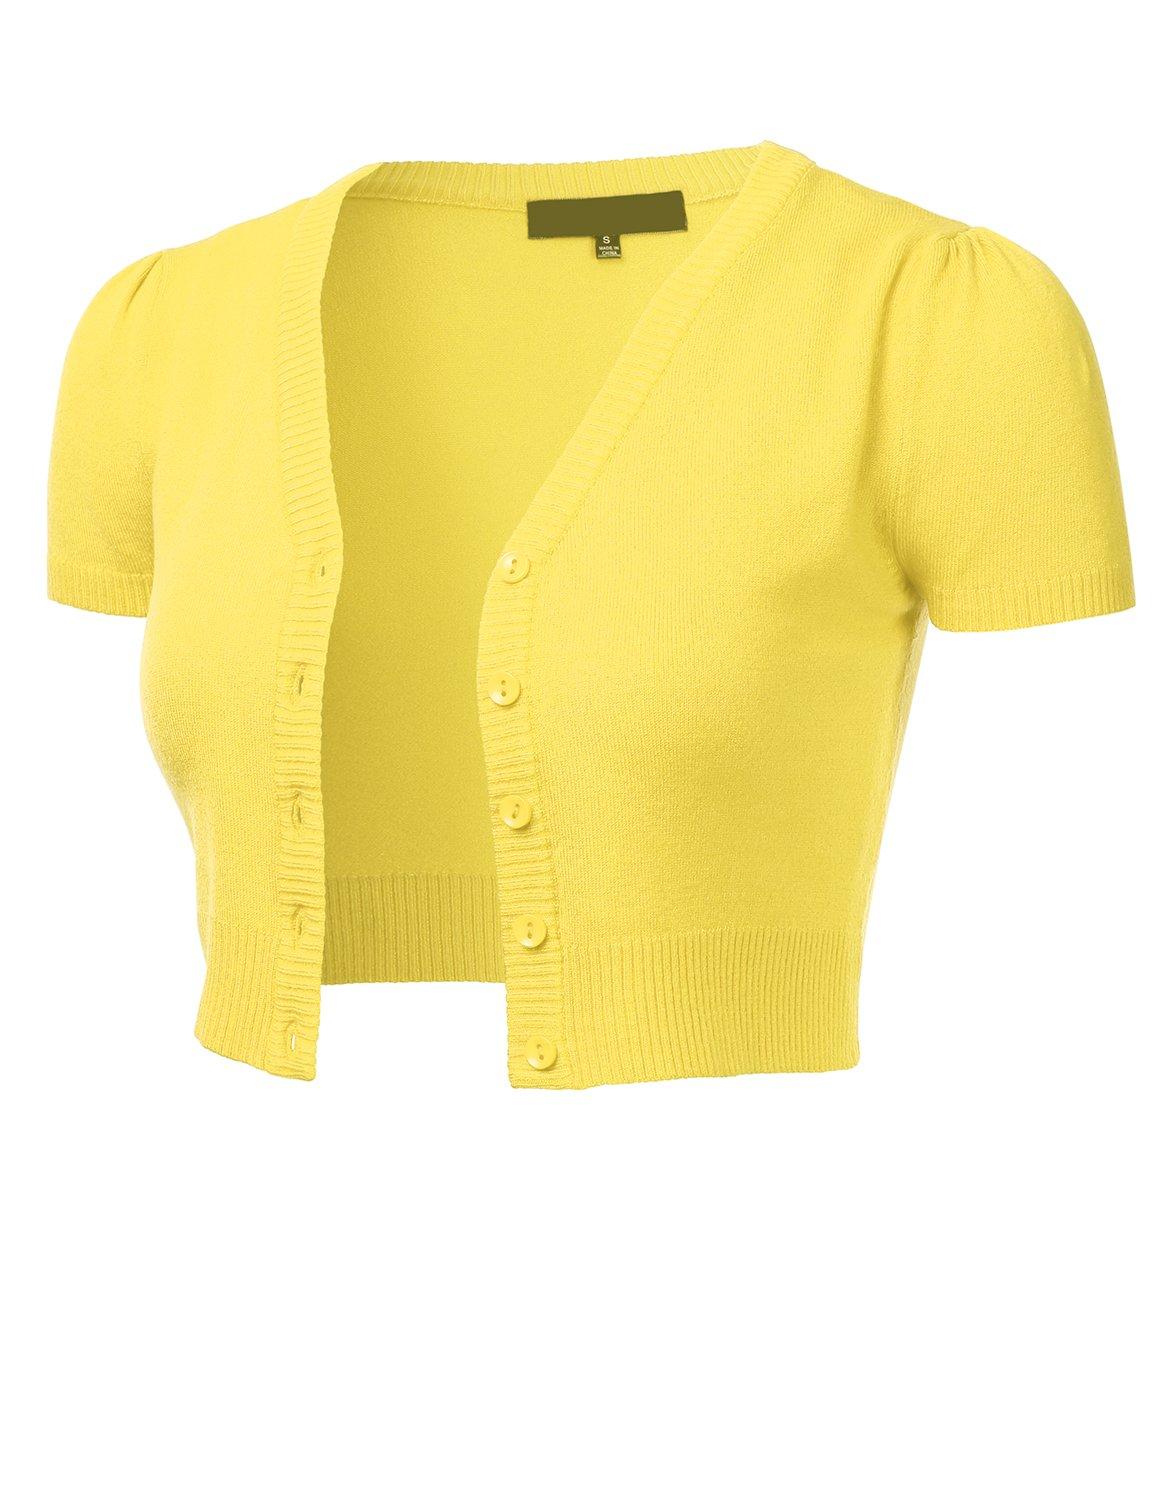 FLORIA Womens Button Down Short Sleeve Cropped Bolero Cardigan Sweater  (S-4X) d615c3a80